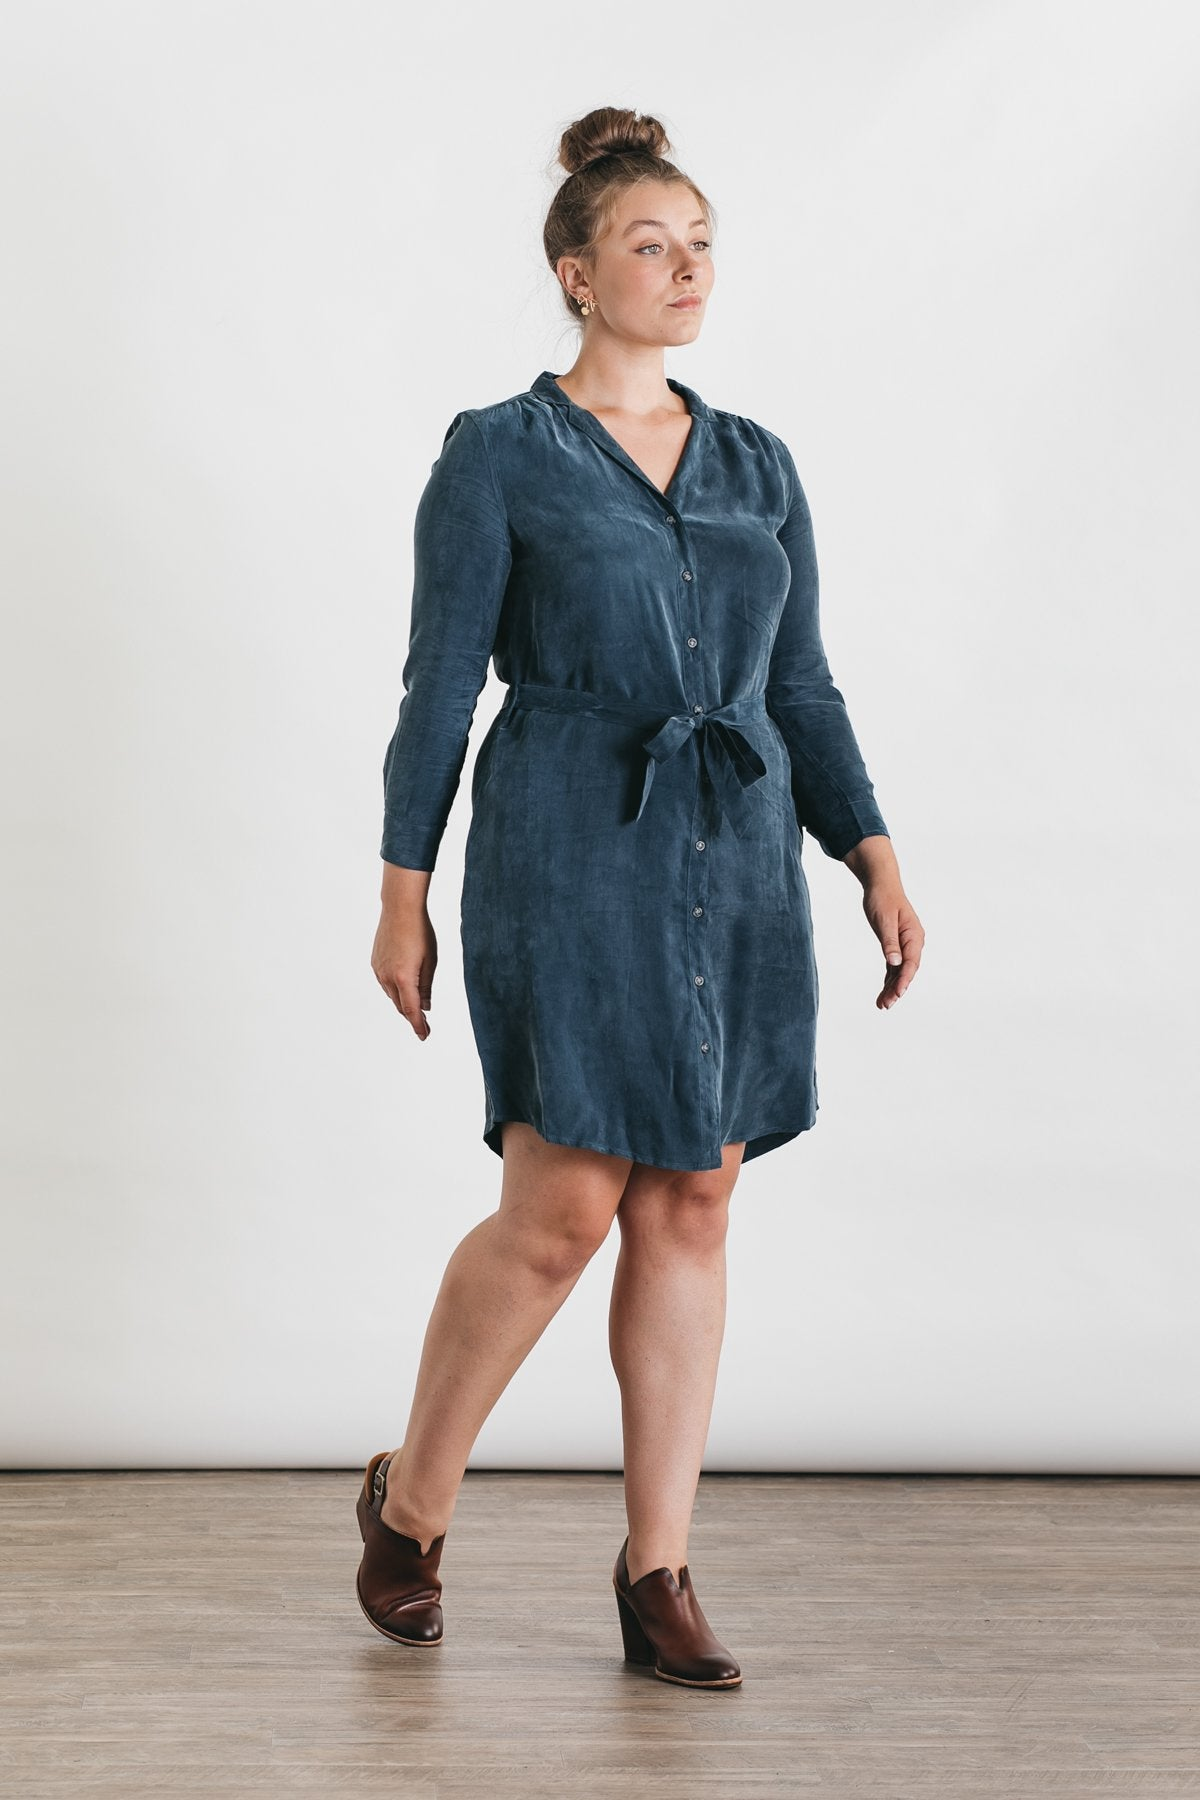 Image of Emery Dress -Pewter Blue